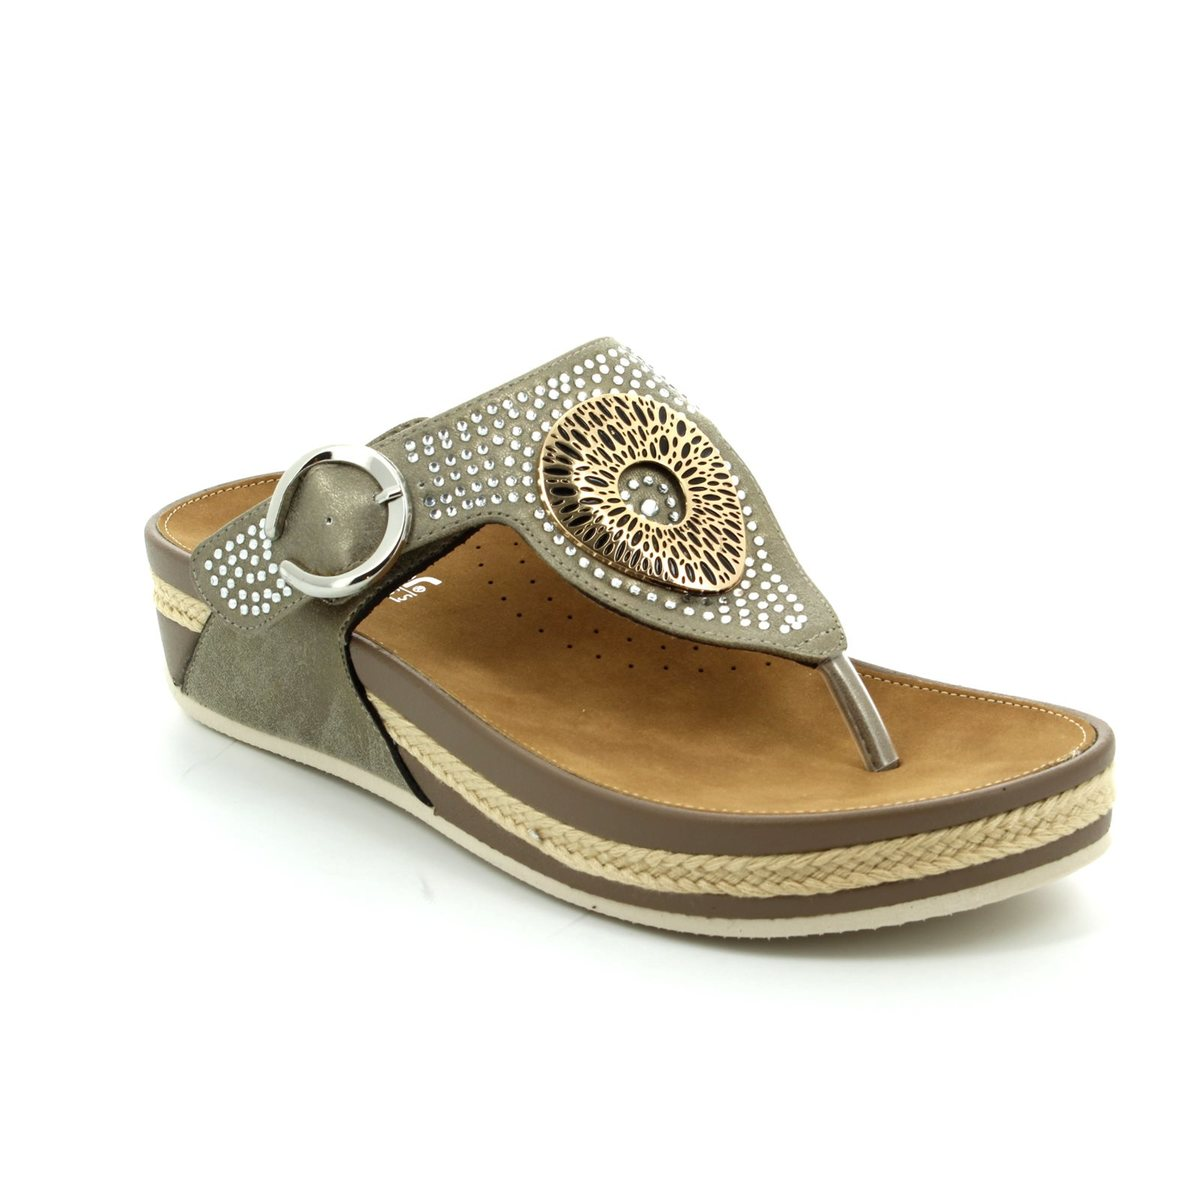 025e9f7434 Rieker Sandals - Metallic - V1460-62 LULU